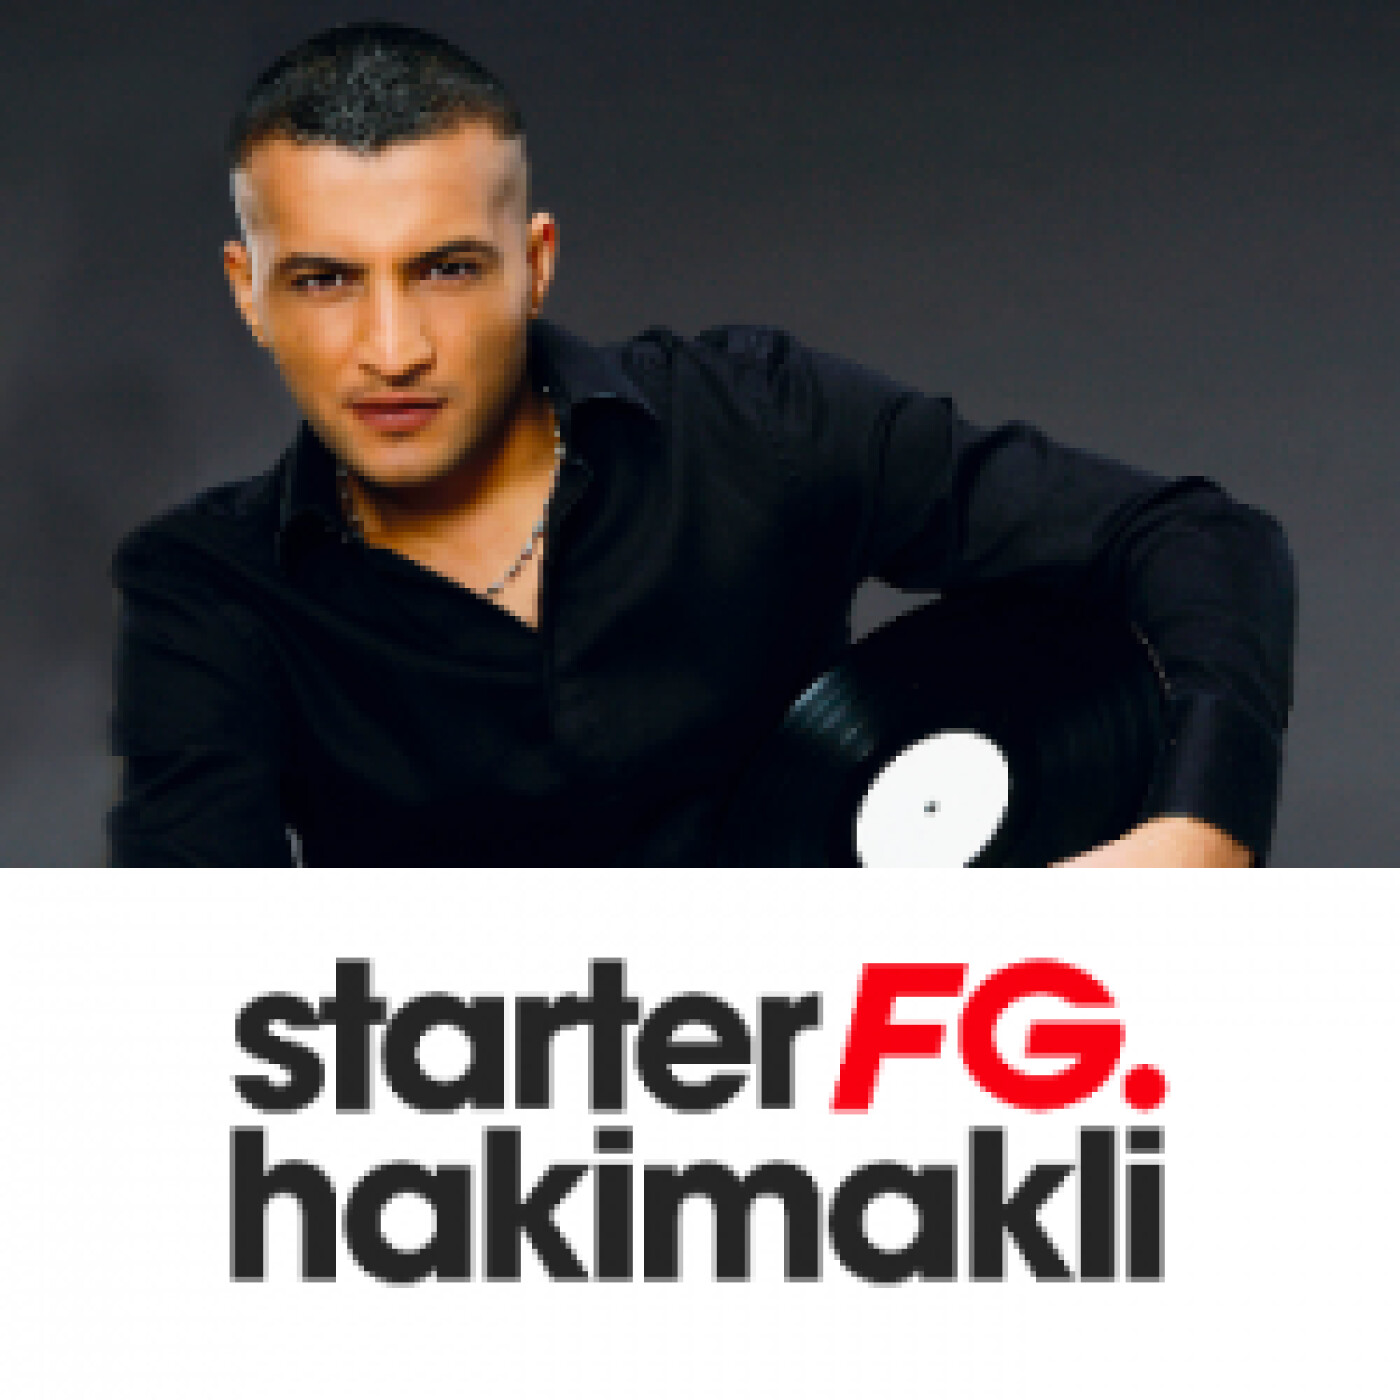 STARTER FG BY HAKIMAKLI LUNDI 1er FEVRIER 2021